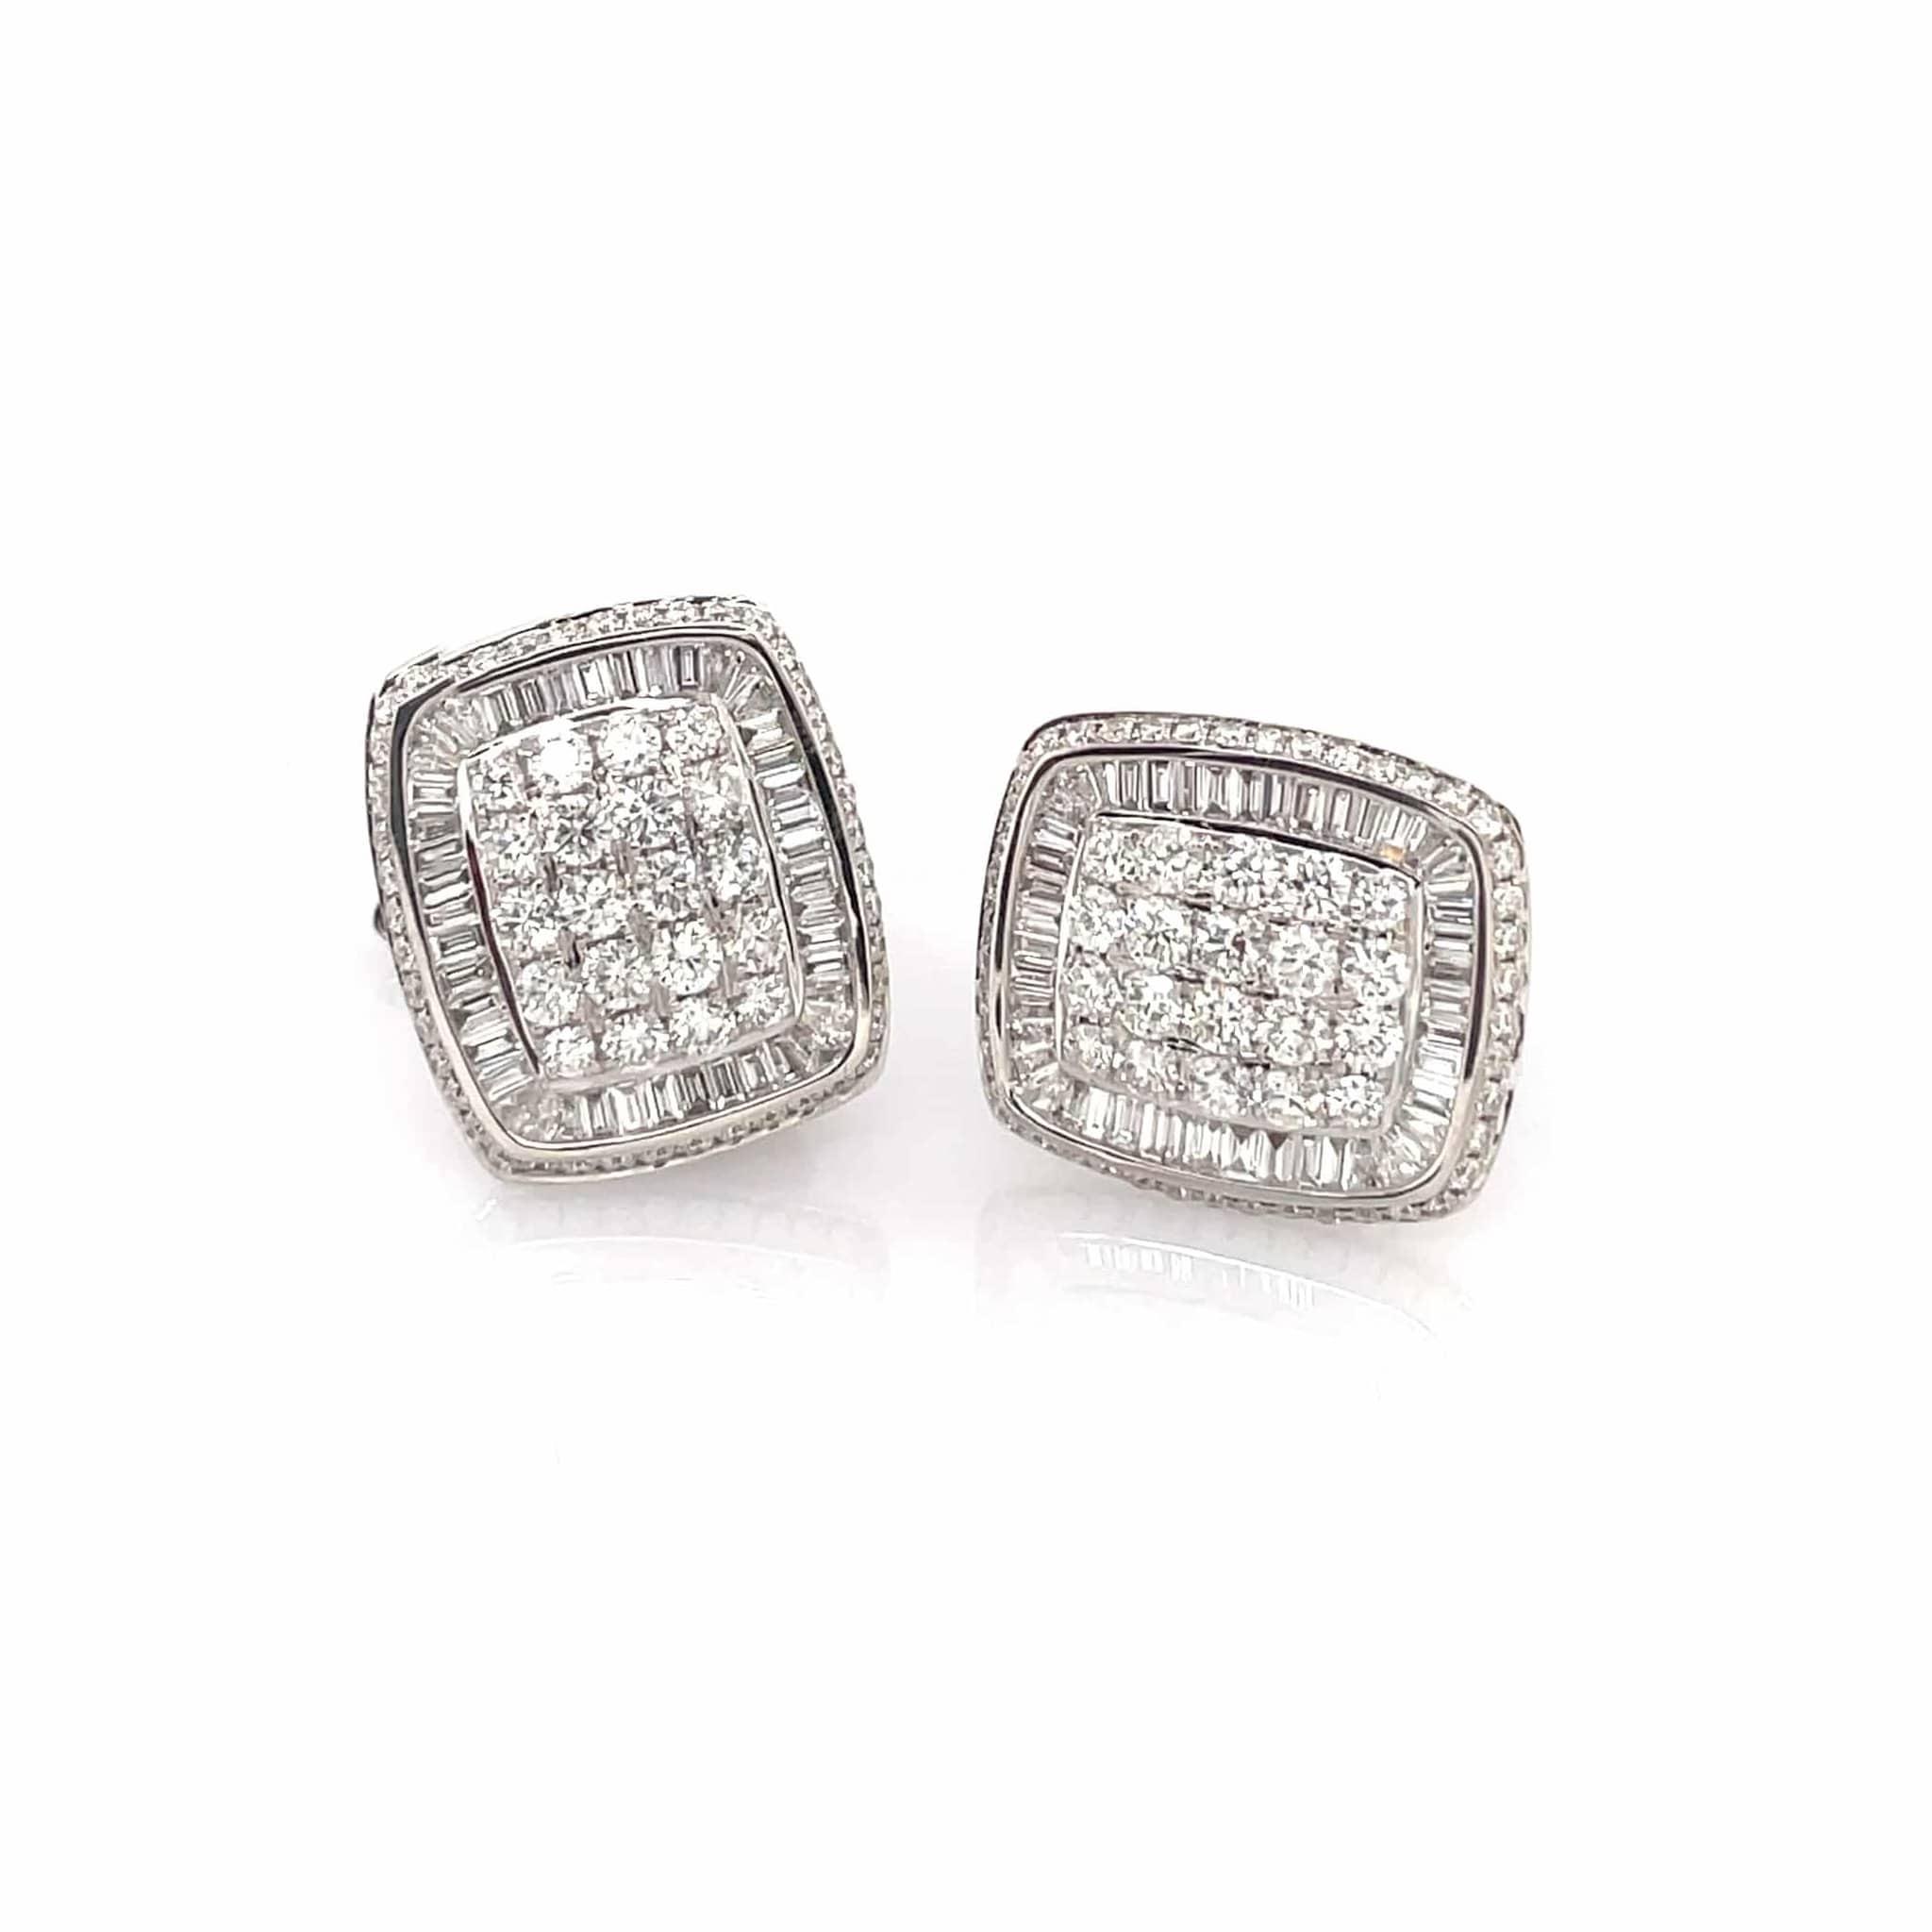 Baguette and Round Brilliant Diamond Cufflinks